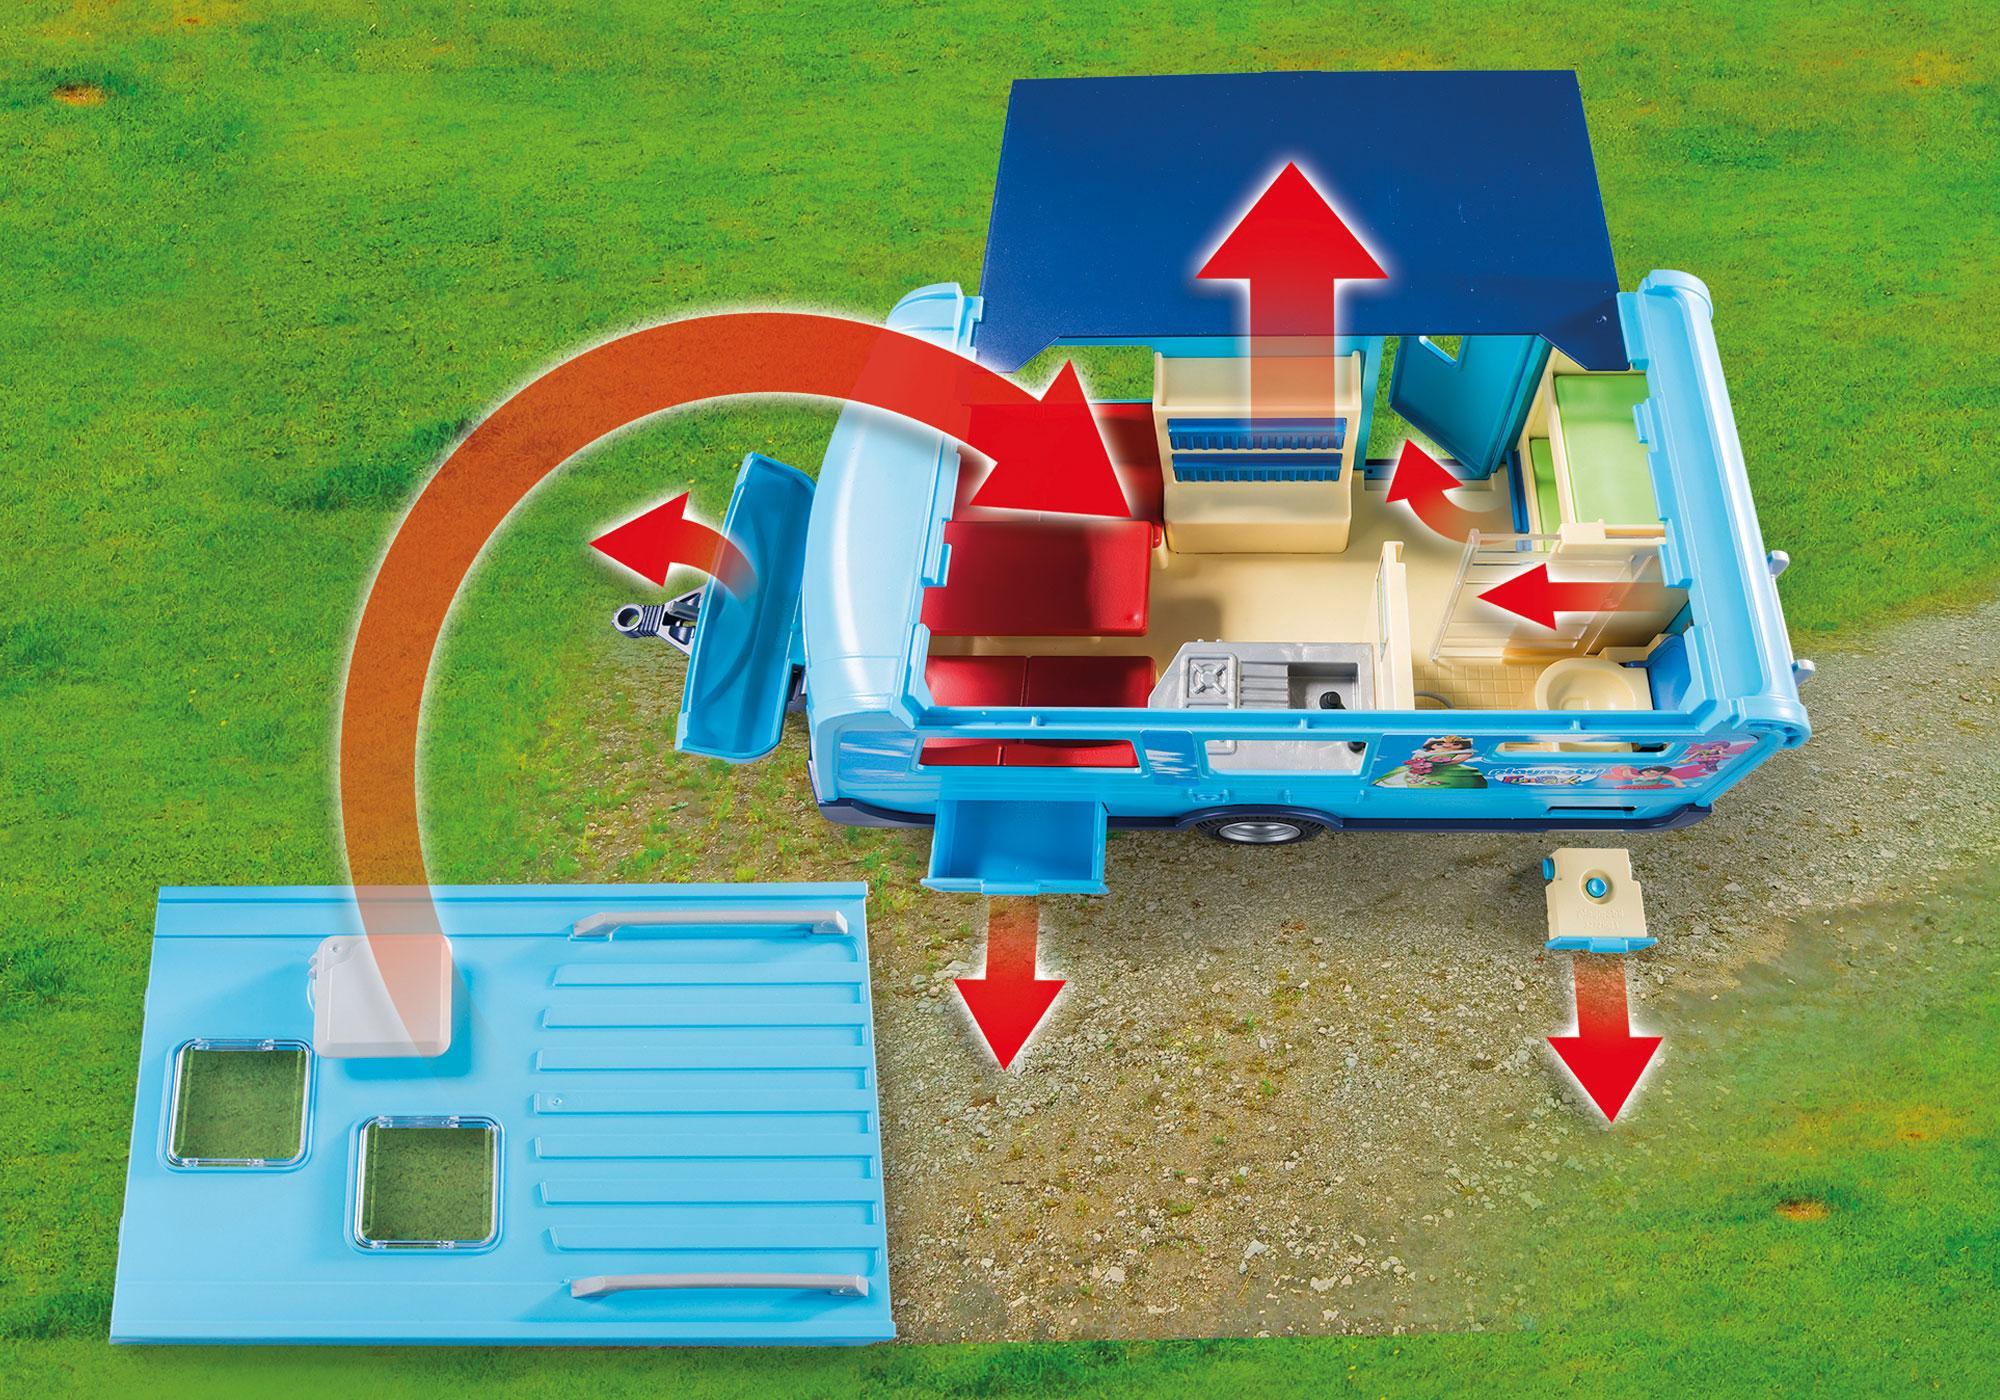 http://media.playmobil.com/i/playmobil/9502_product_extra2/PLAYMOBIL-FunPark Pick-Up mit Wohnwagen